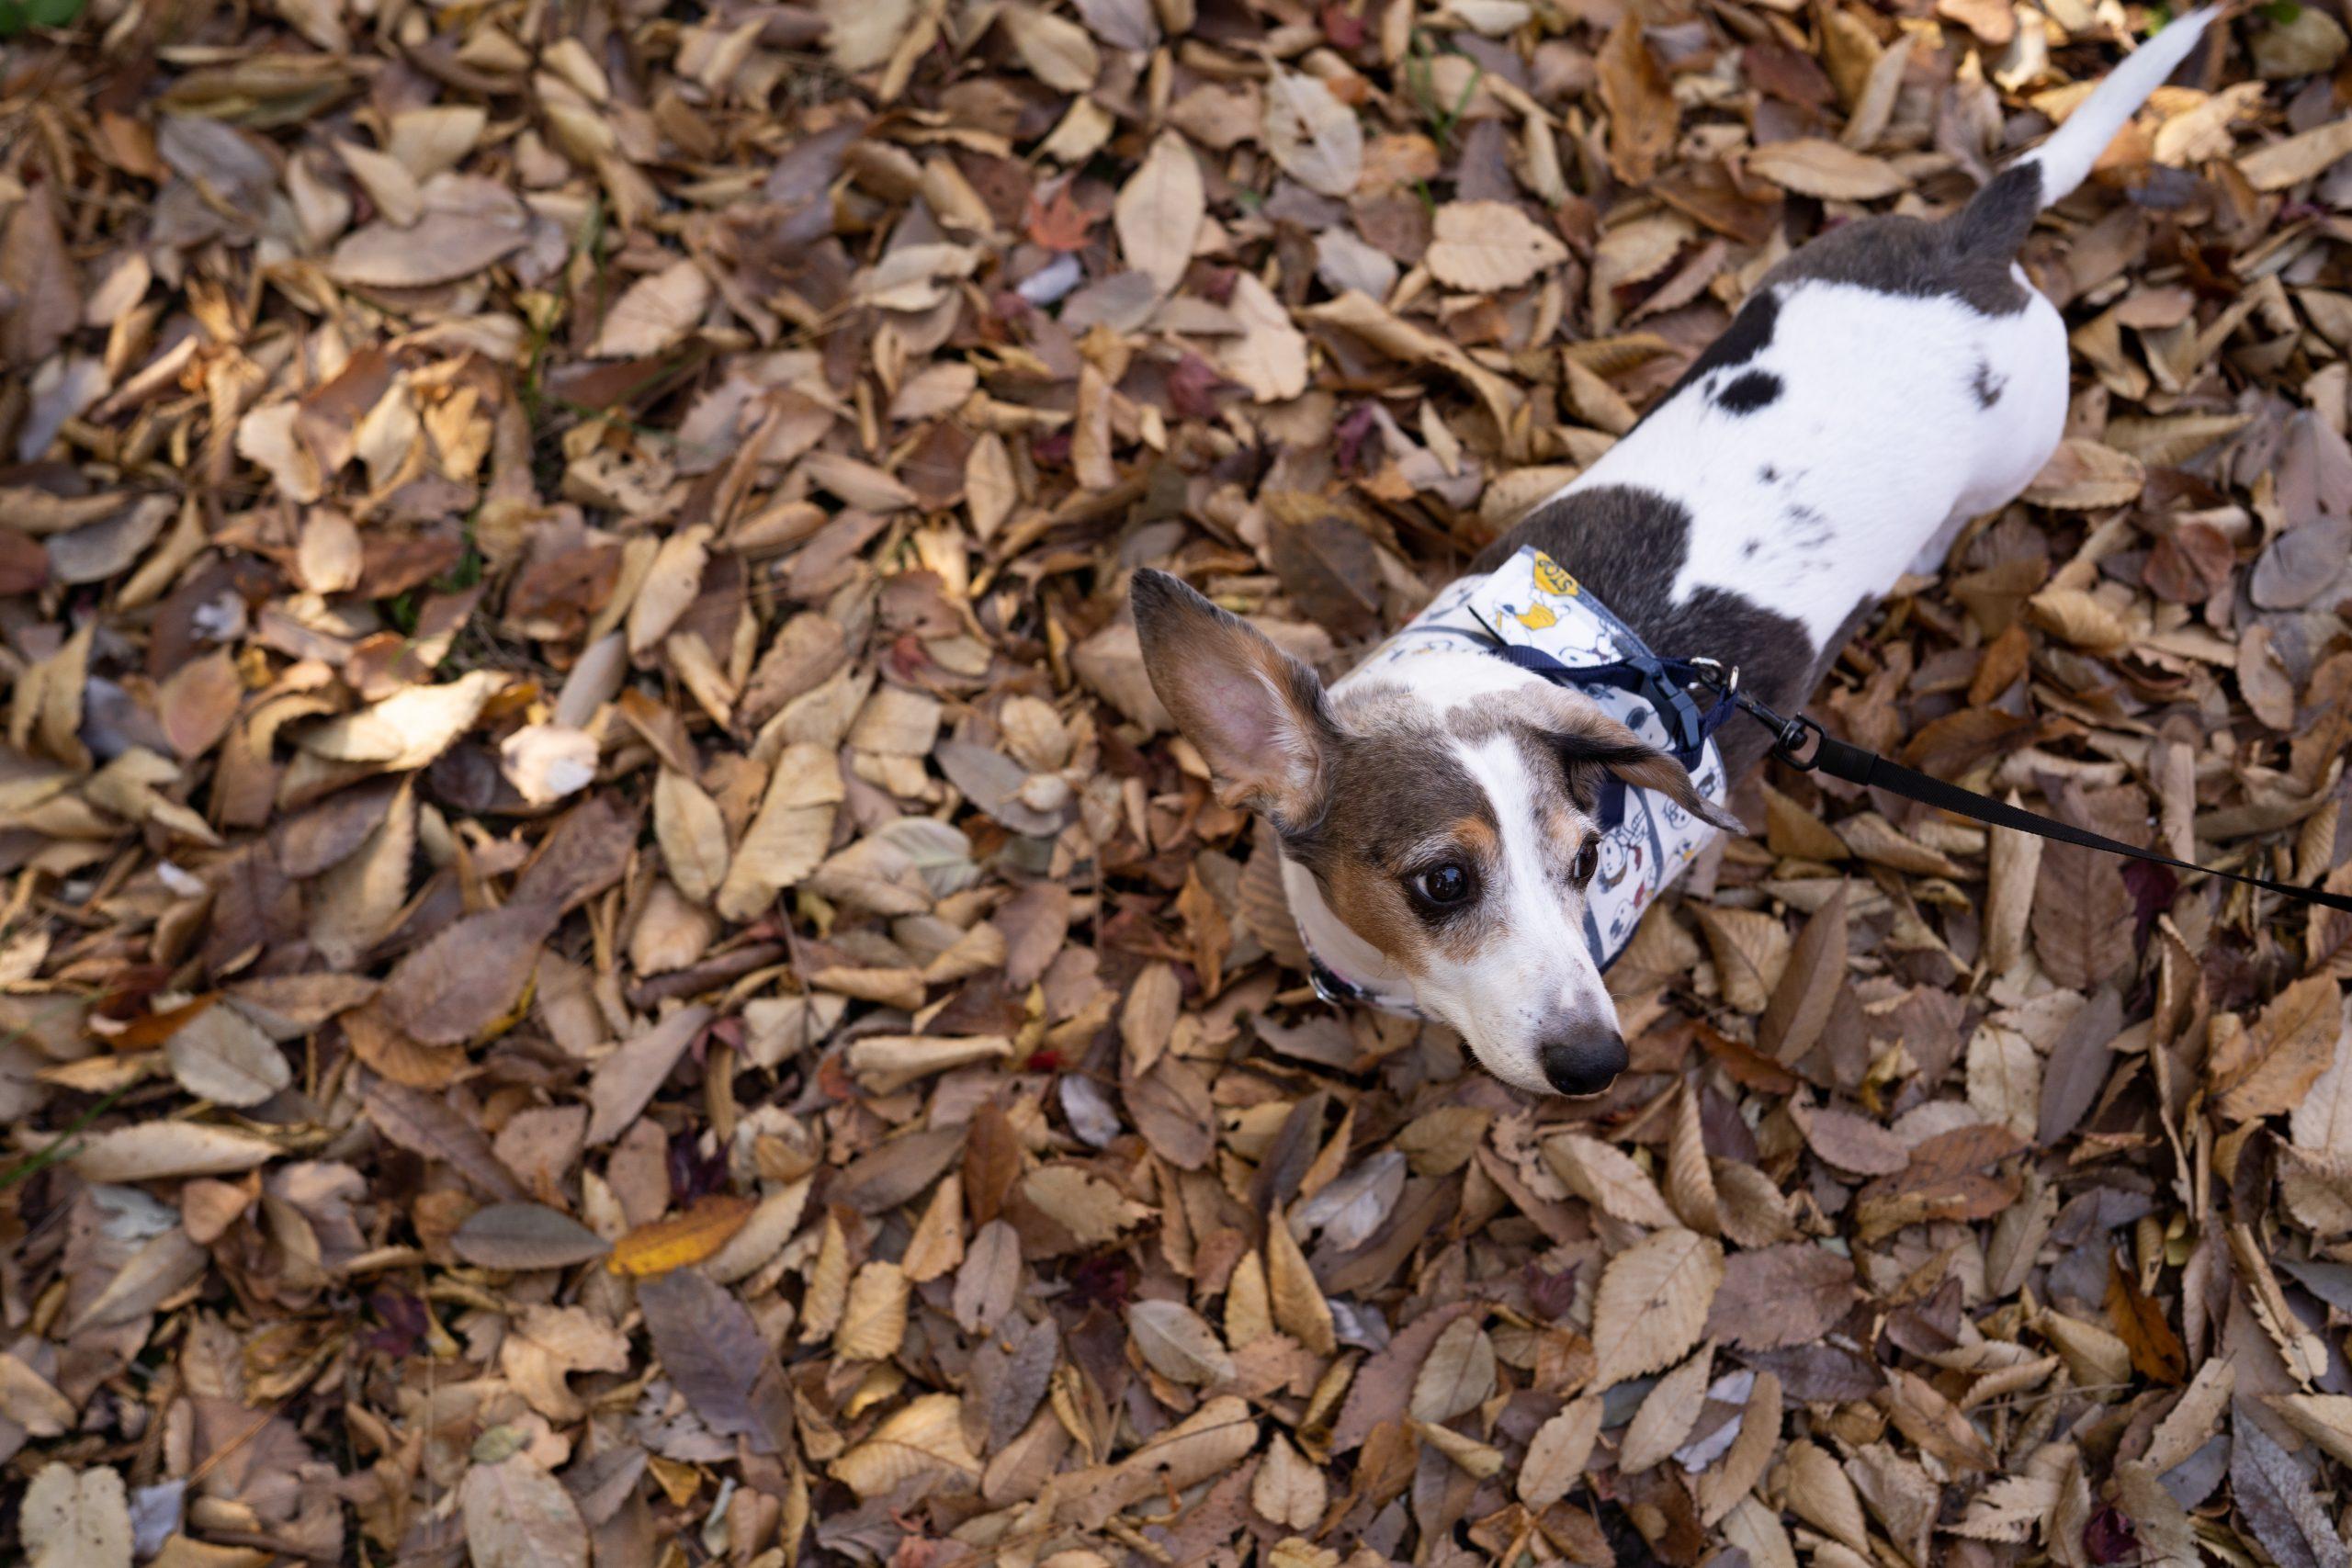 【SONY】カールツァイスと一緒に「紅葉」と「犬散歩」